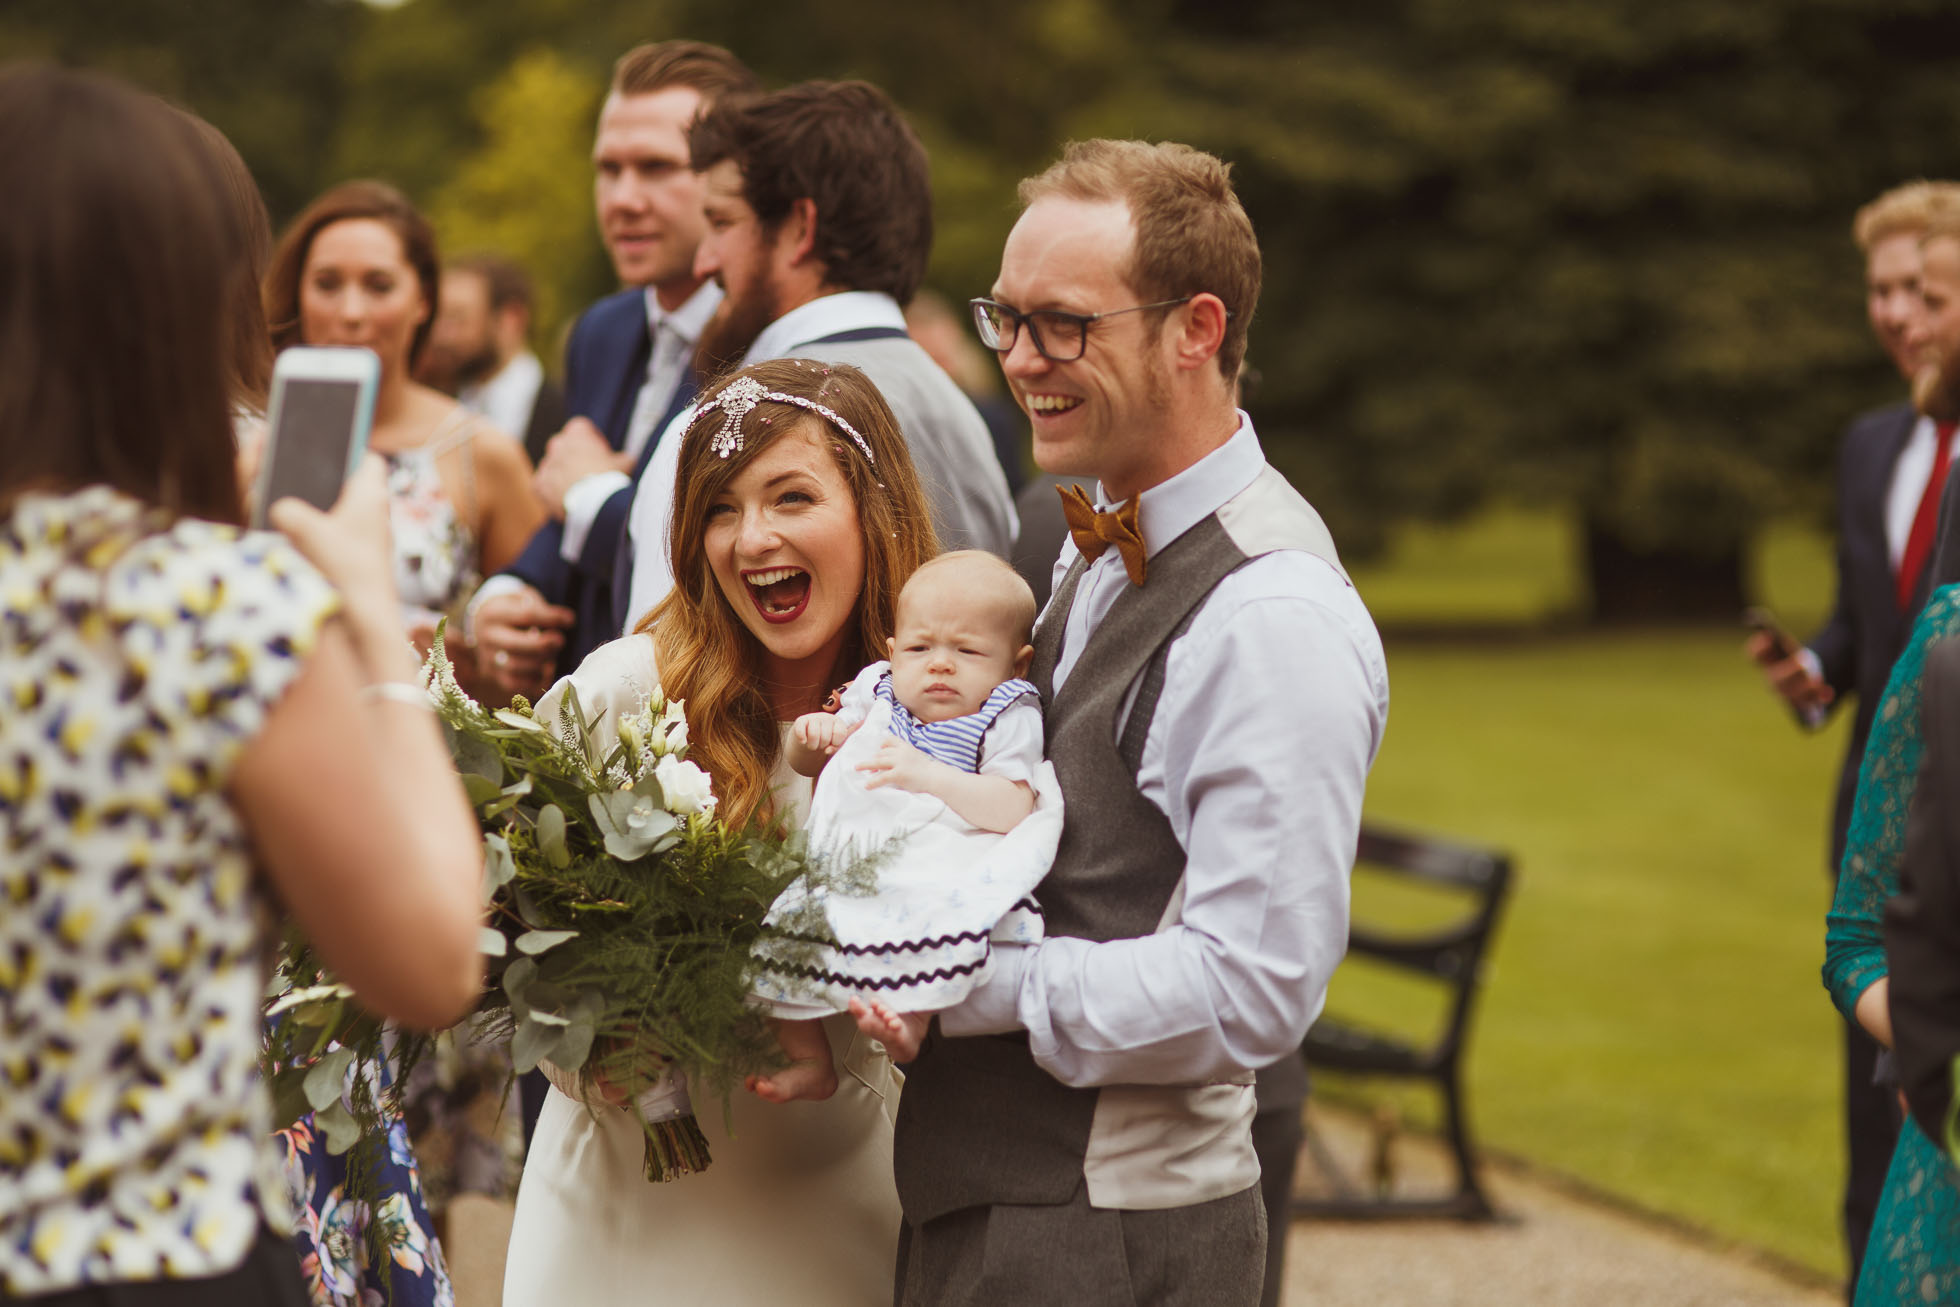 sheffield-botanical-gardens-wedding-photographer-30.jpg